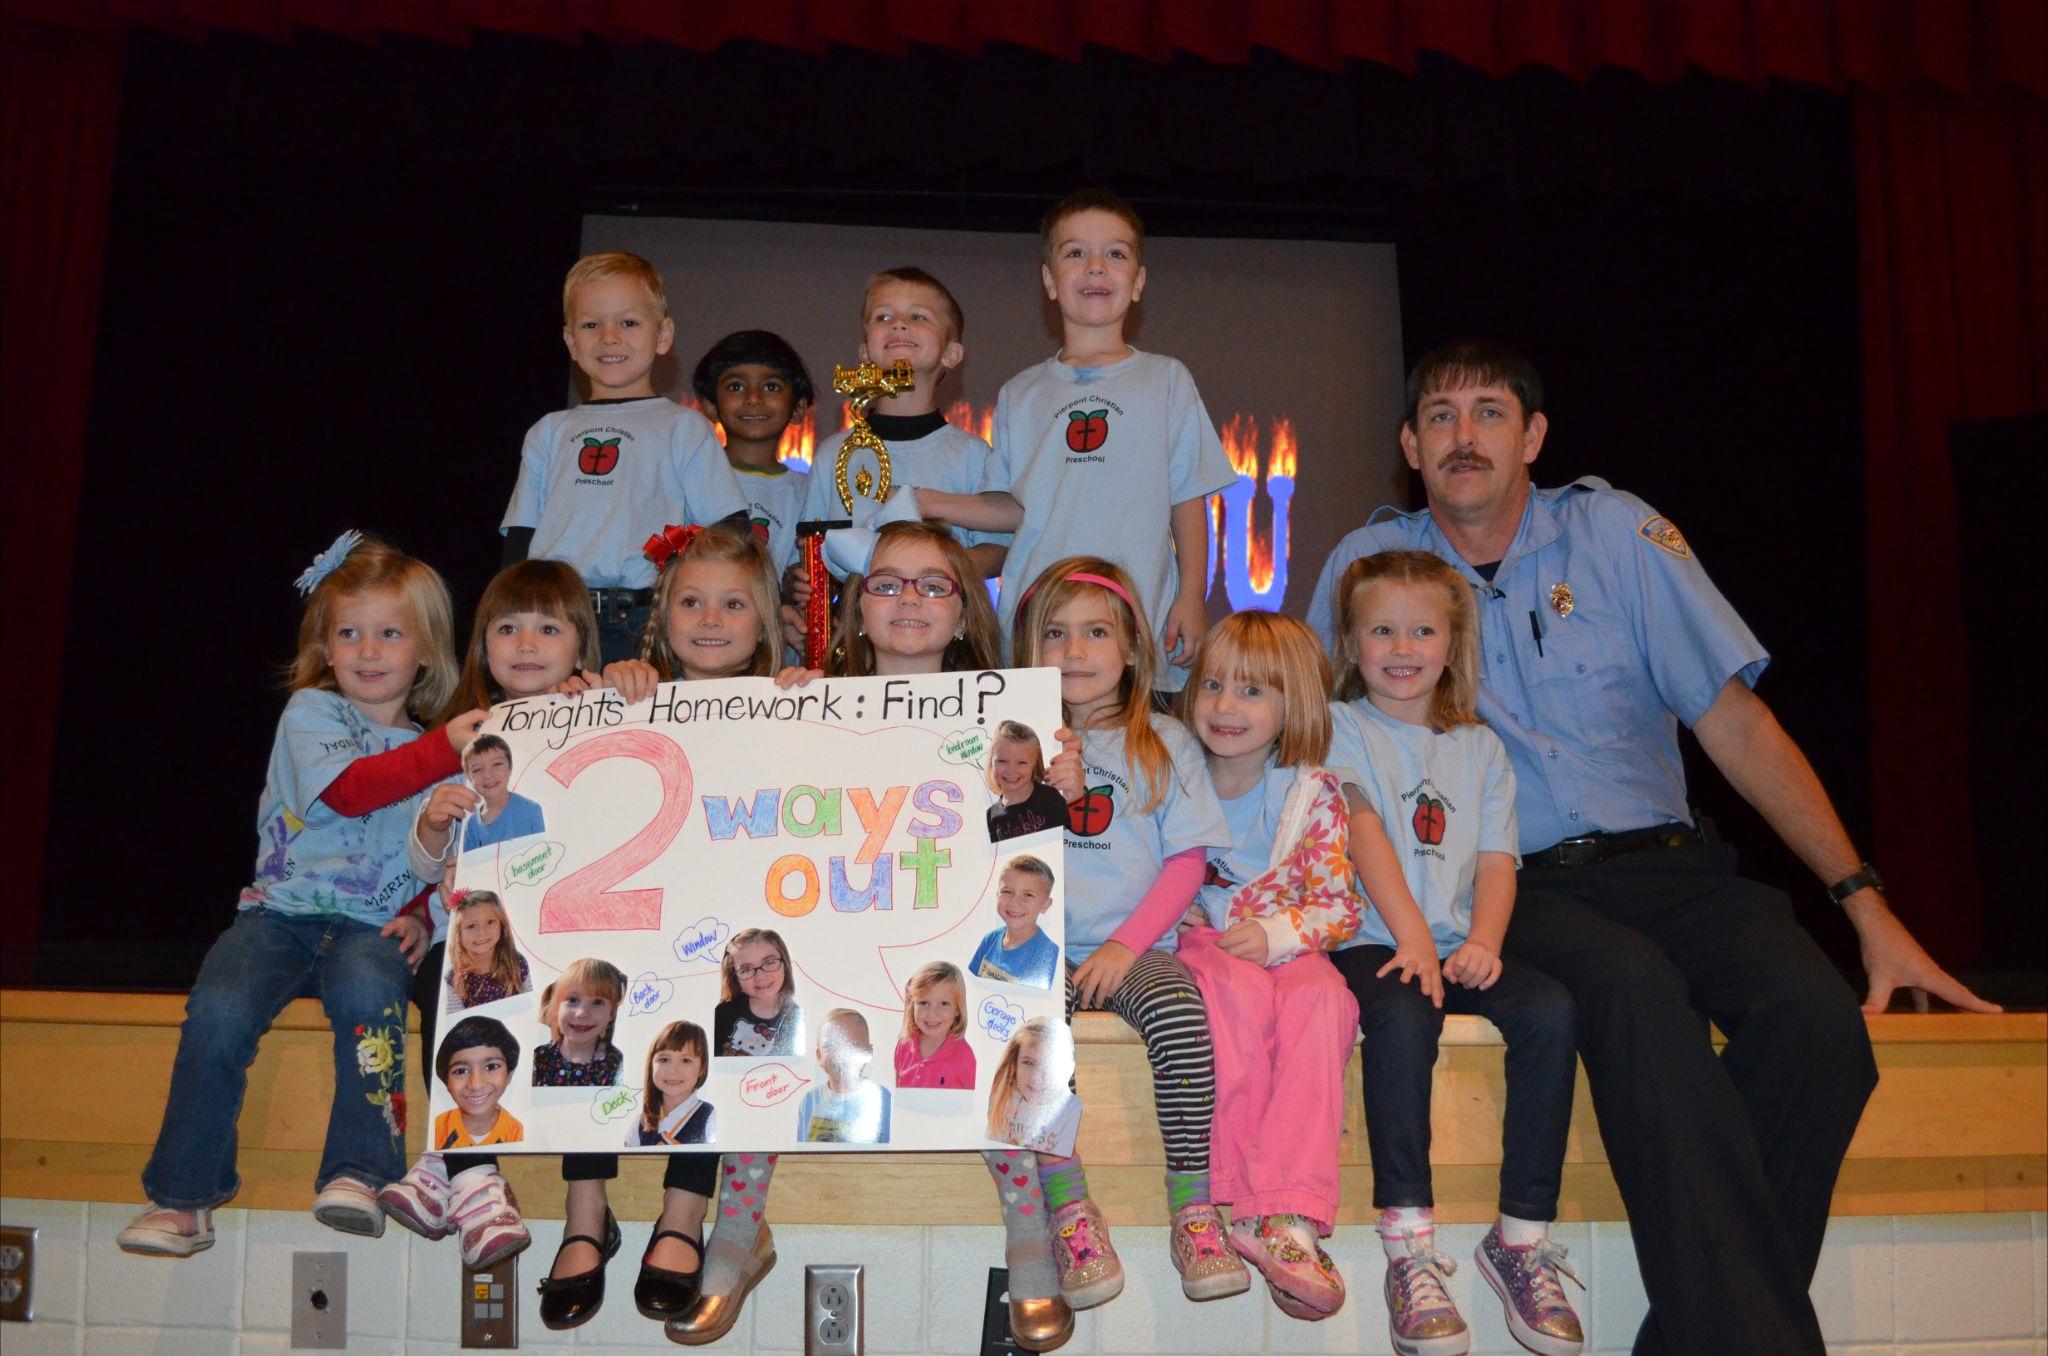 2012-10-10 10.21.15 - Fire Safety Field Trip